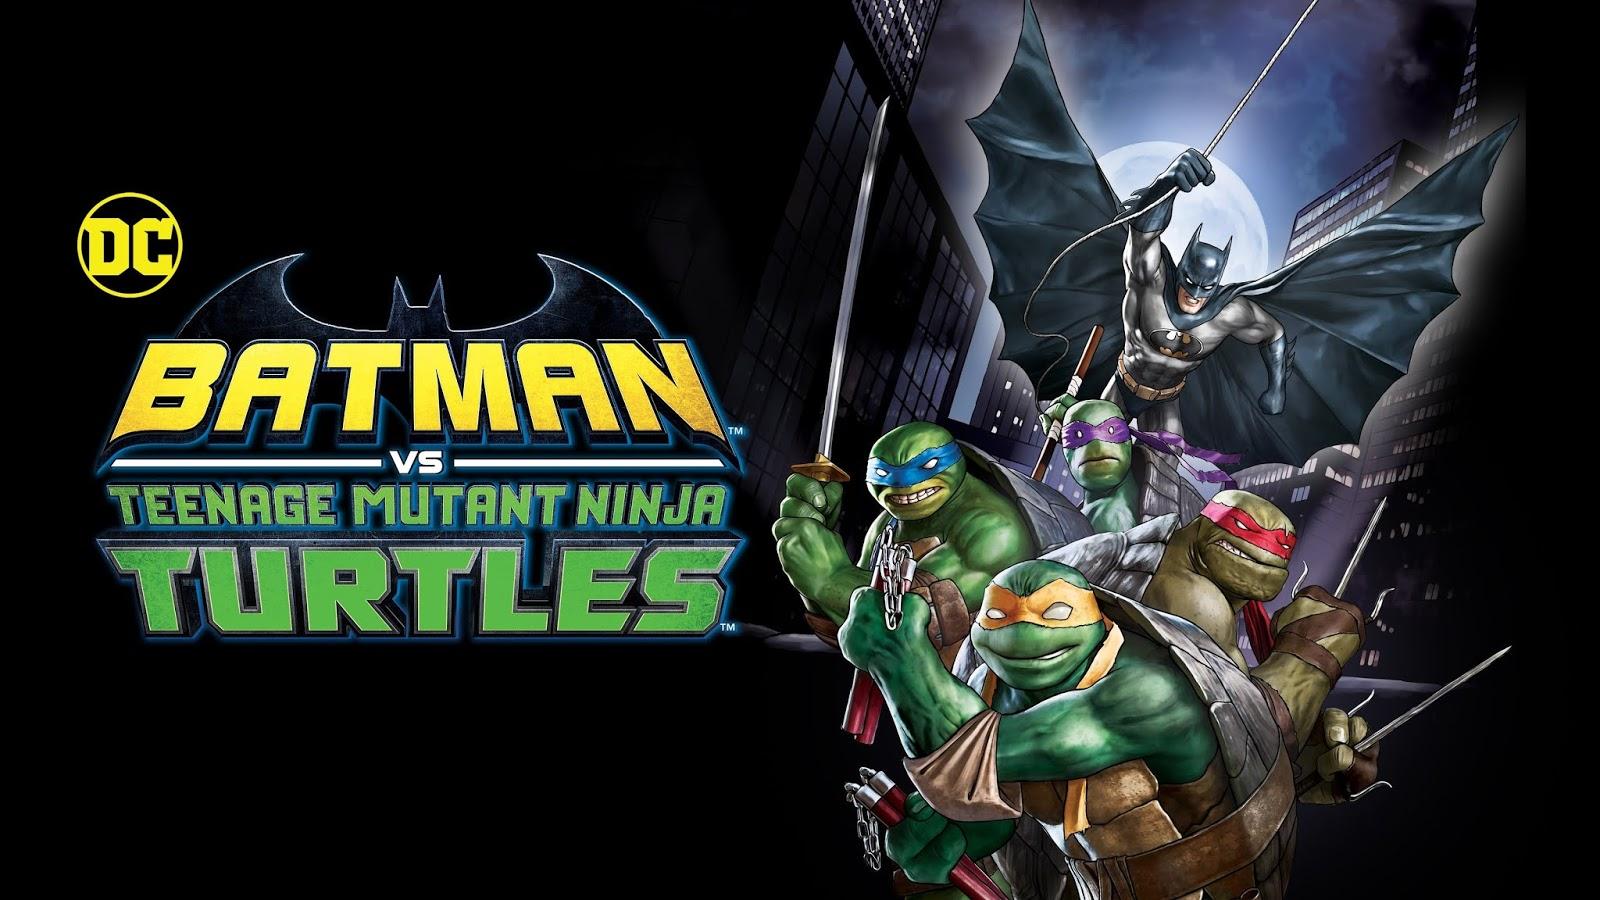 Nickalive Nicktoons Usa To Premiere Batman Vs Teenage Mutant Ninja Turtles On Wednesday November 27 2019